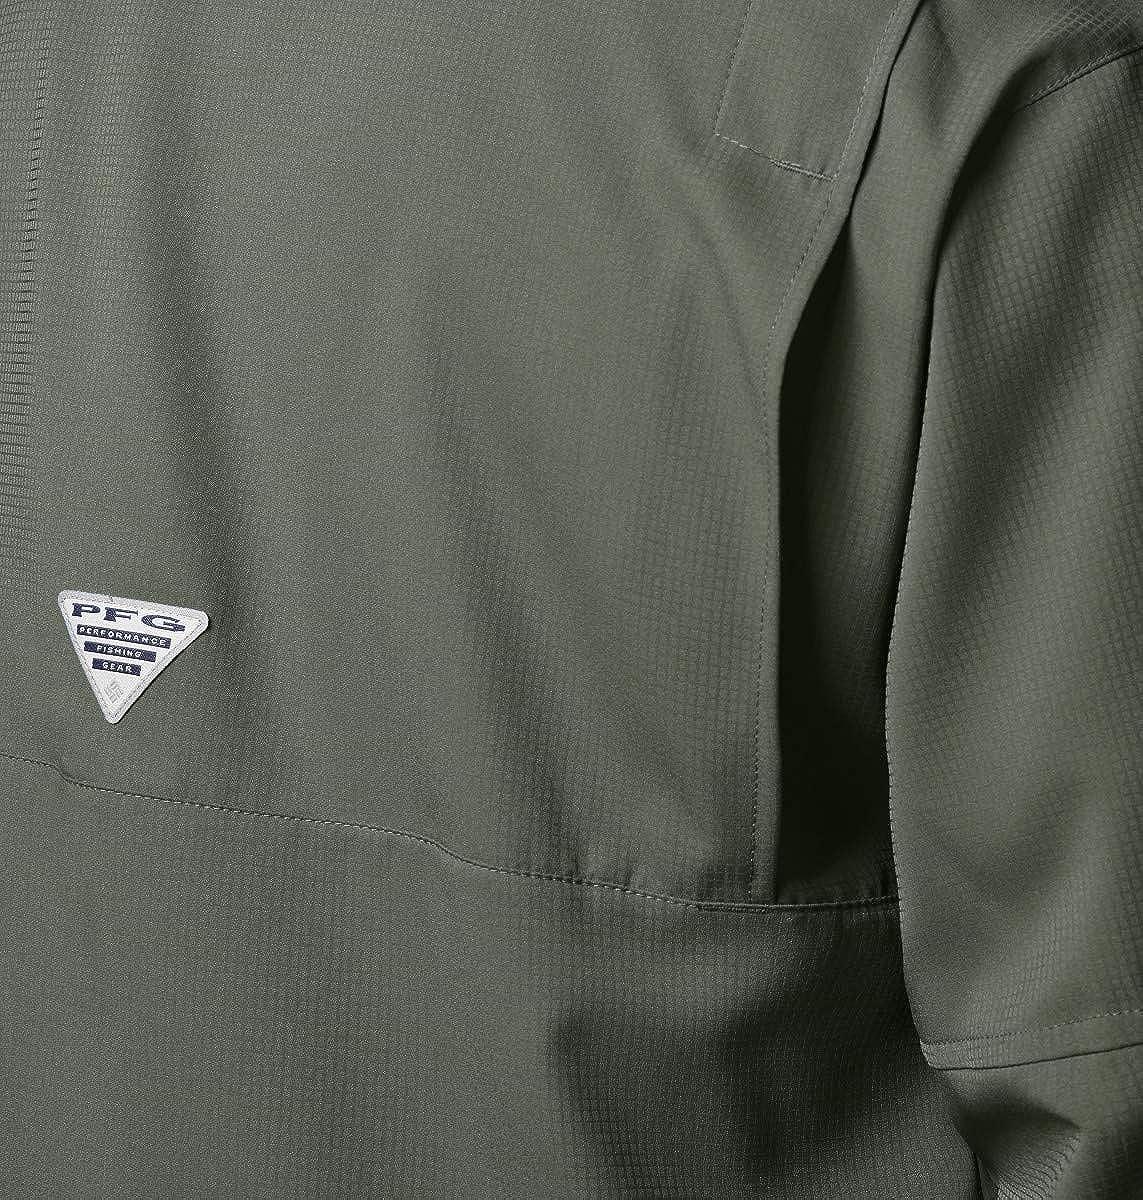 Columbia Men's PFG Tamiami II UPF 40 Long Sleeve Fishing Shirt